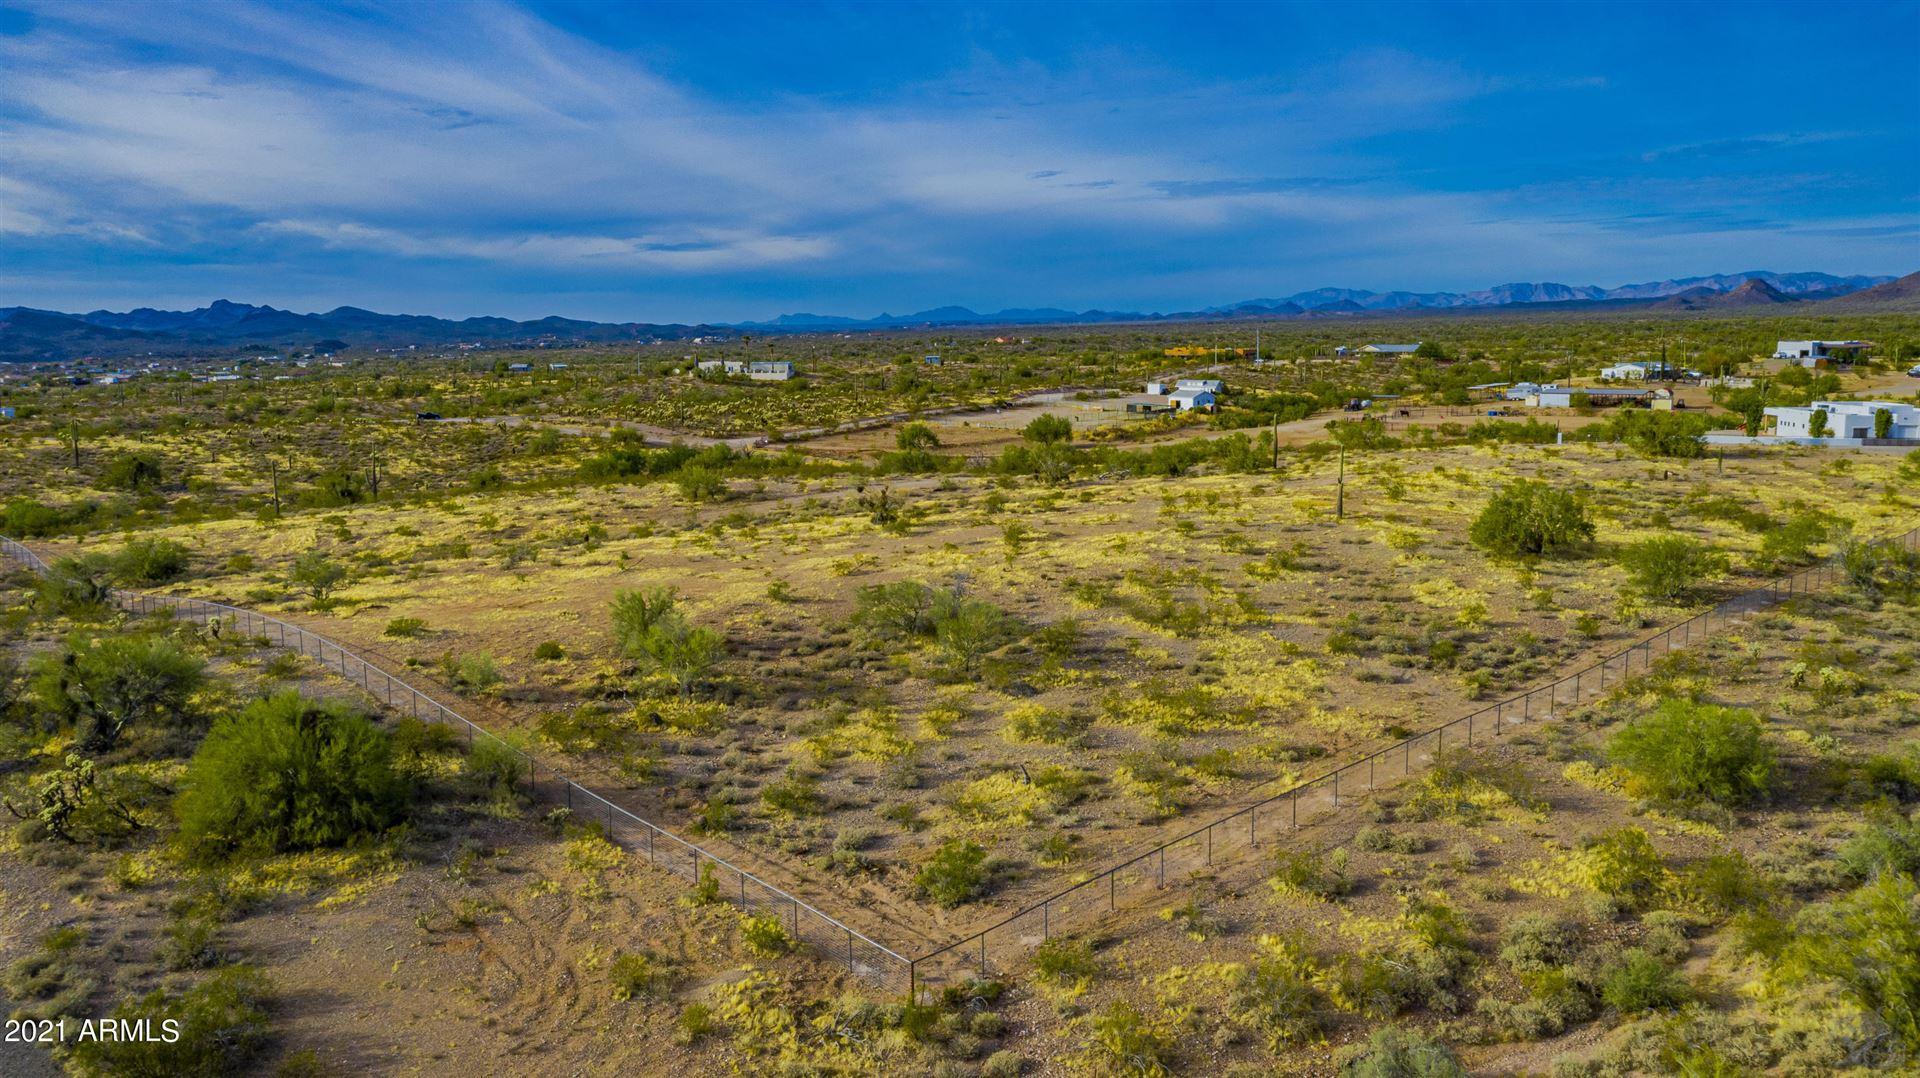 Photo of 40000 N 253rd lot 2 Road, Morristown, AZ 85342 (MLS # 6217603)